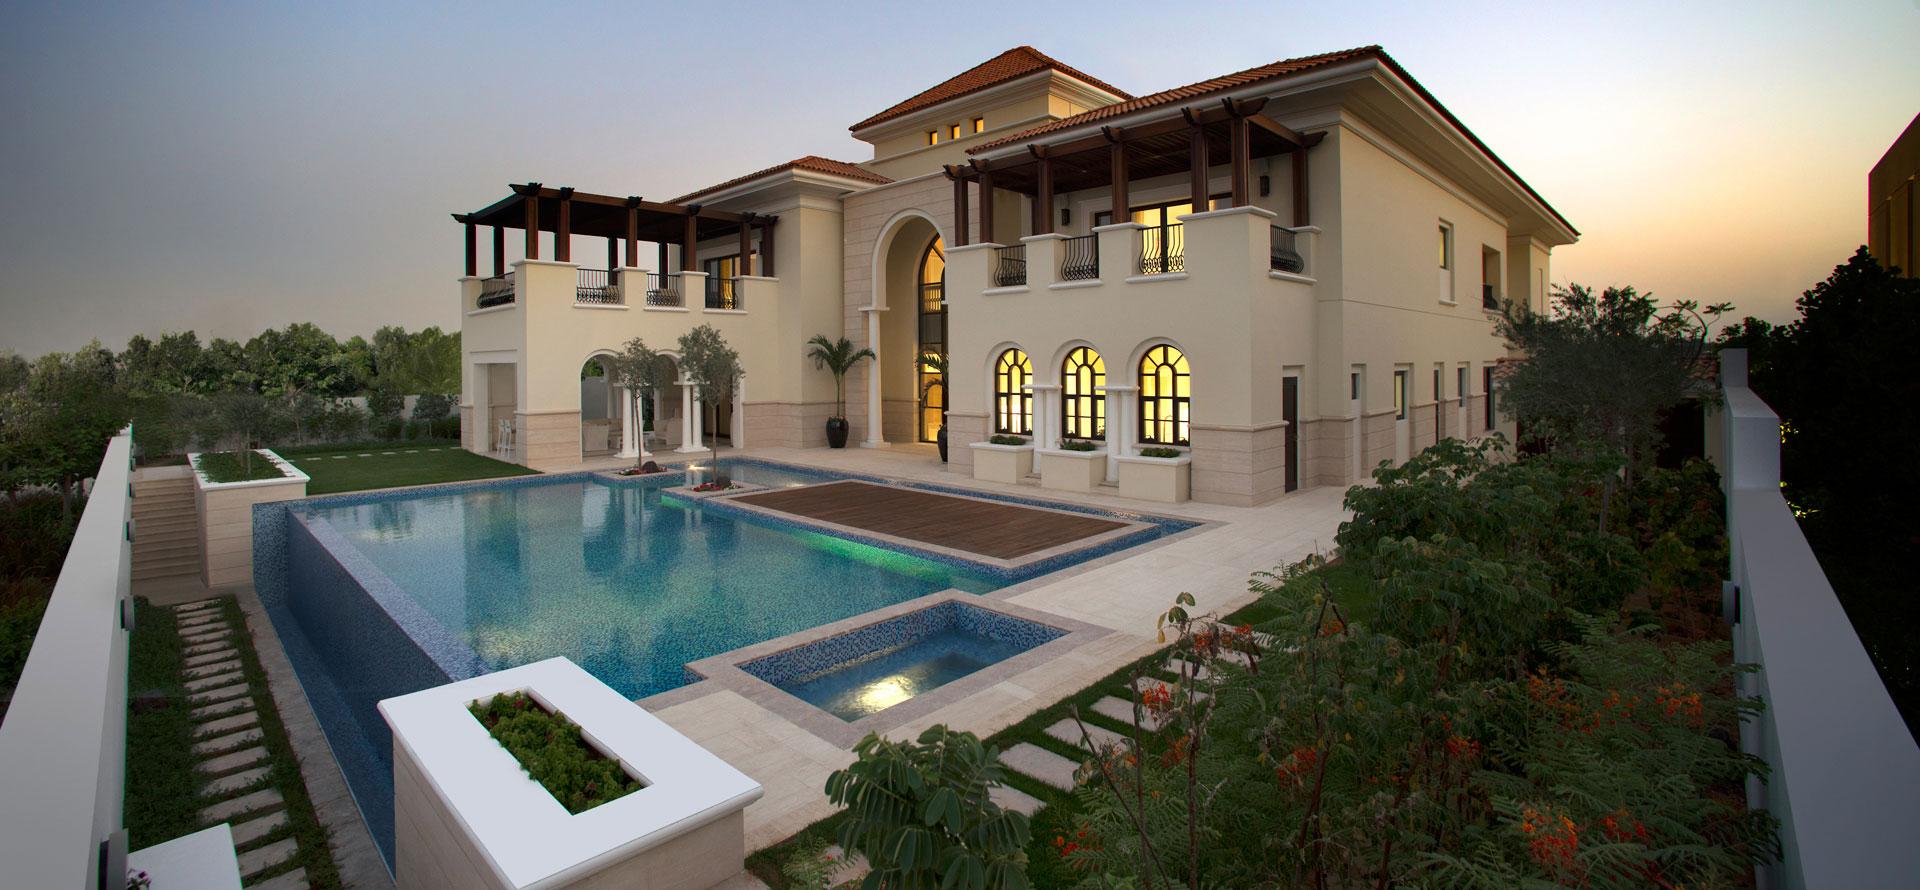 Mansion-Mediterranean-1 jpg.jpg